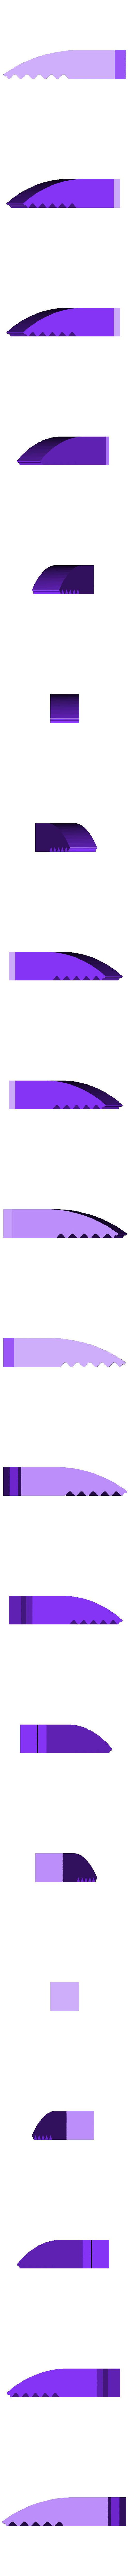 Top_clamp.STL Download STL file Crocodile Vise Clamps (attachment for Solder Helper Hands) • 3D printing design, benspawn